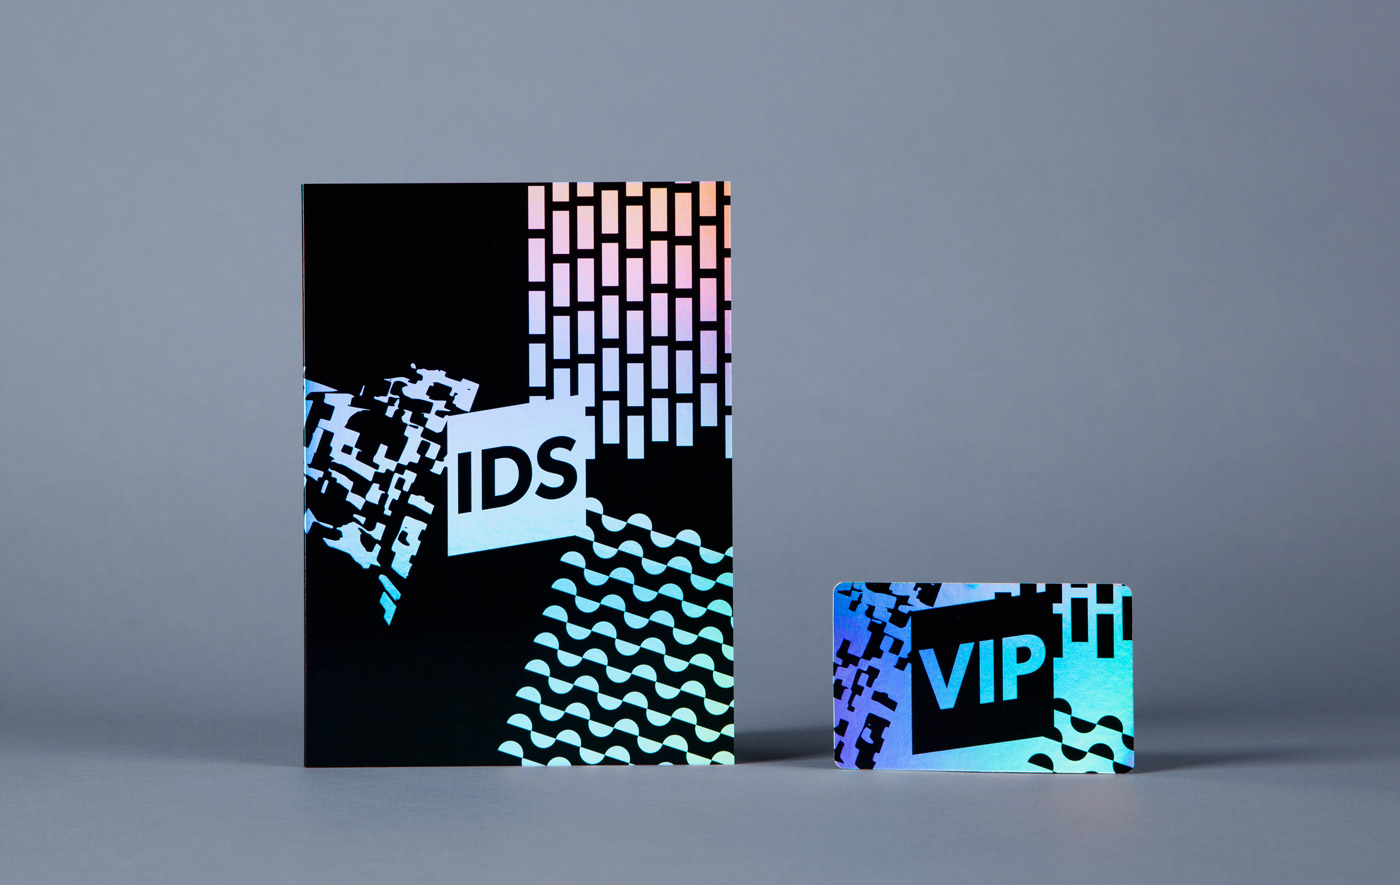 Interior Design Show 2015 / VIP